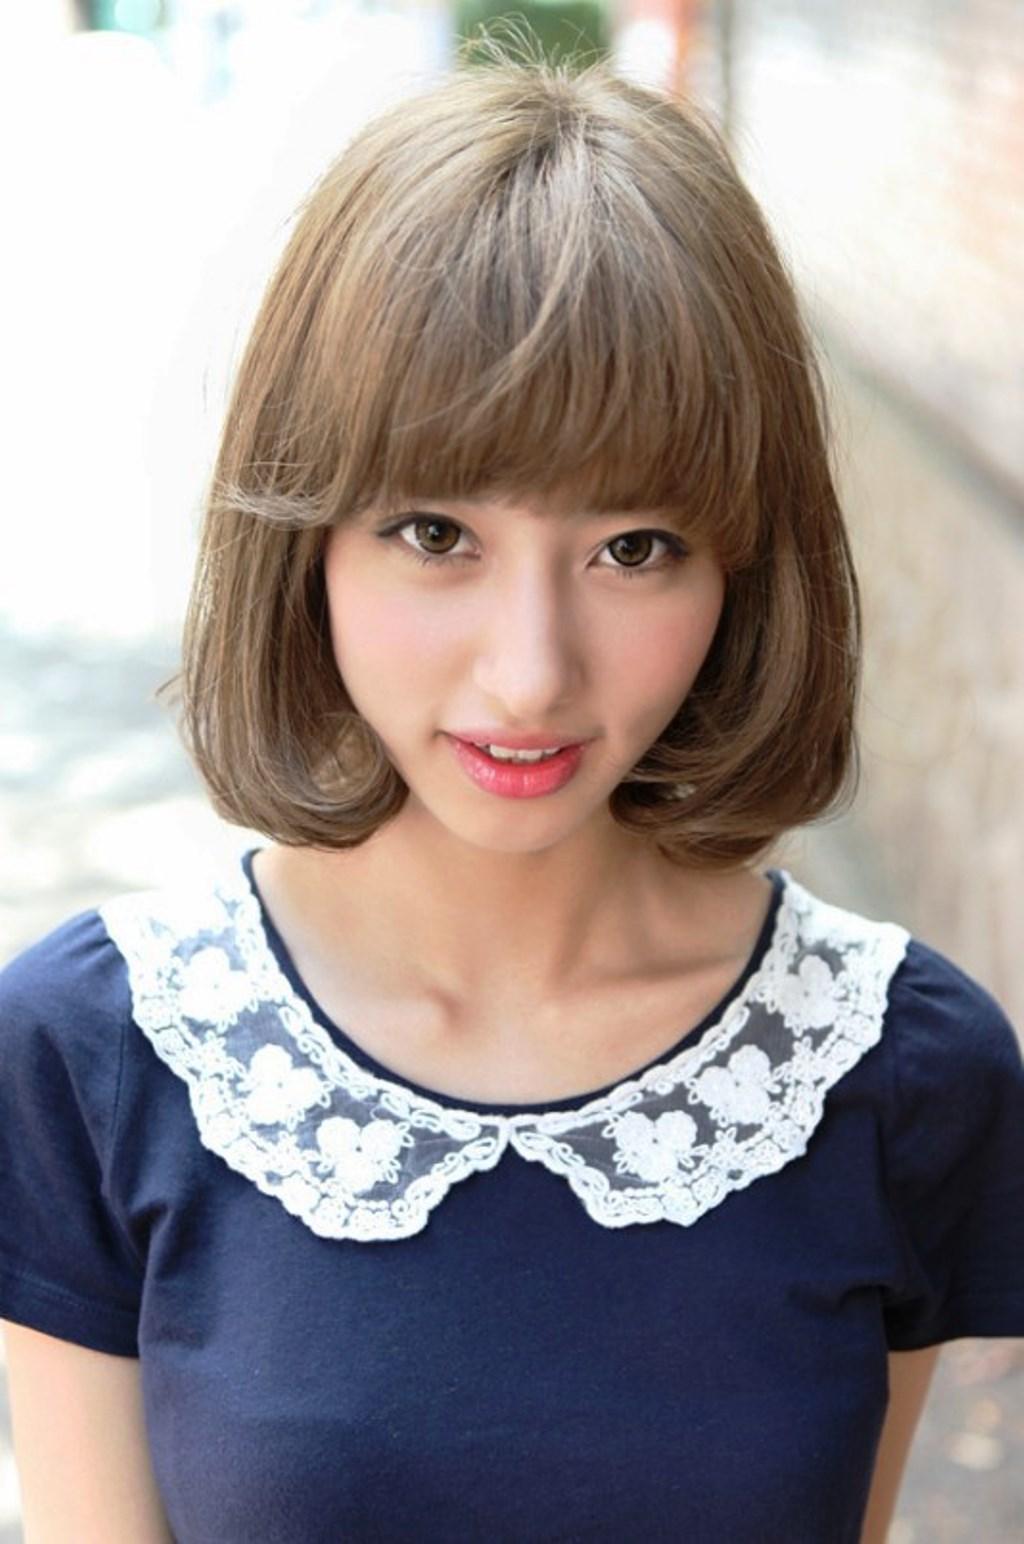 https://www.10500.com.tw/uploads/tadgallery/2020_01_22/436_2013-Cute-Japanese-Bob-Hairstyle-For-Women.jpg 女生短髮